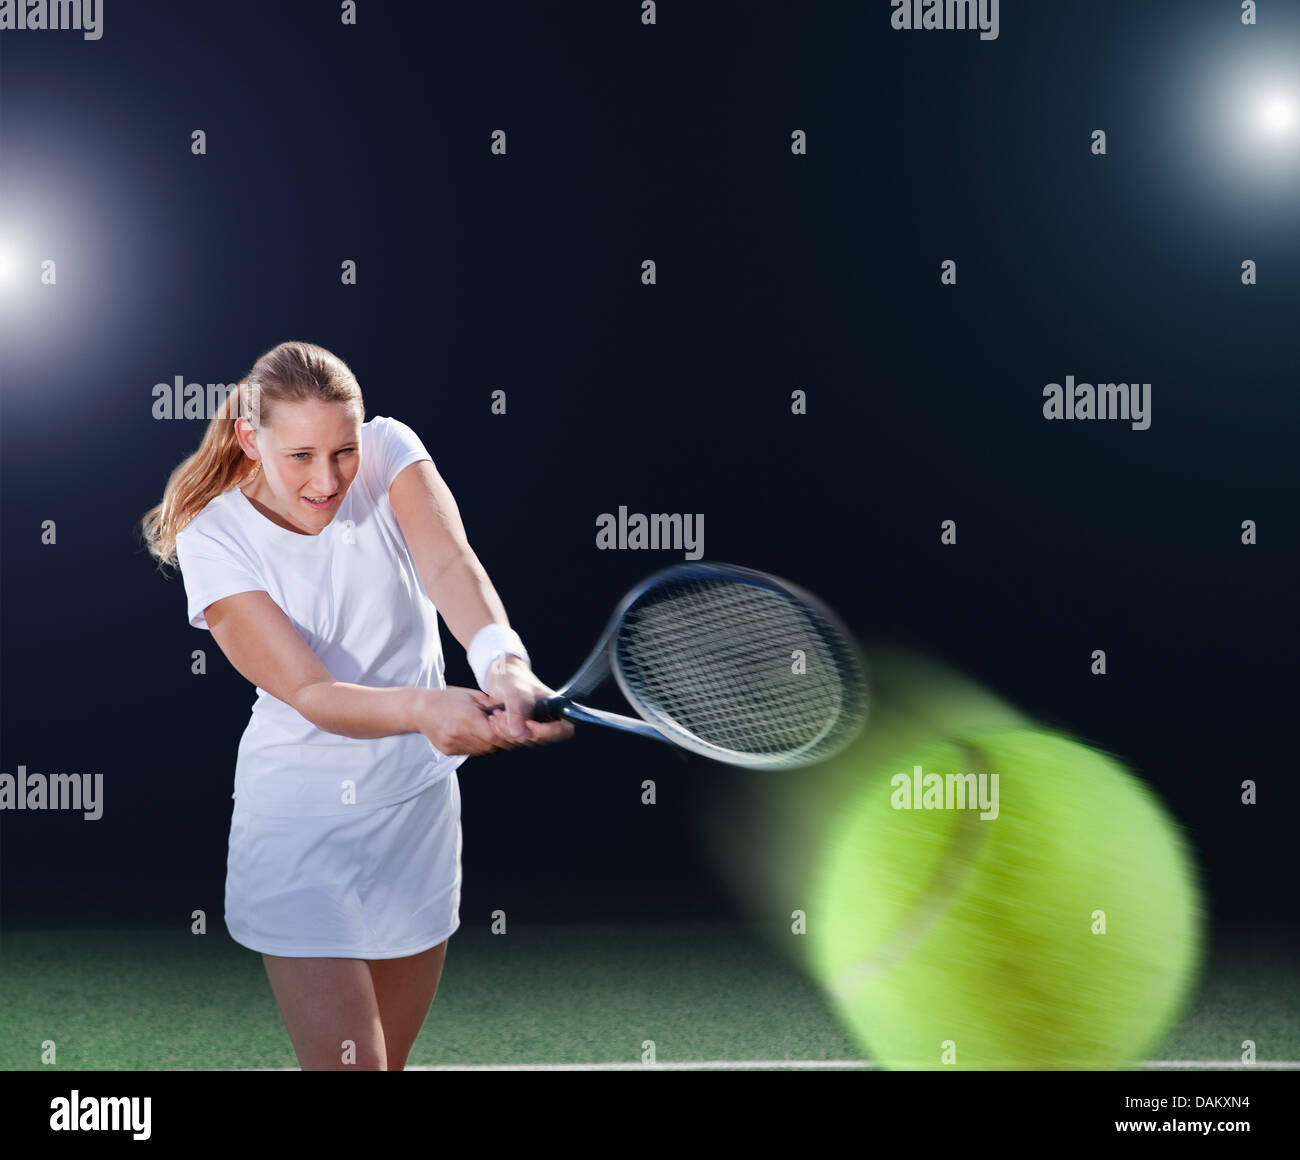 Tennis player hitting ball on court - Stock Image